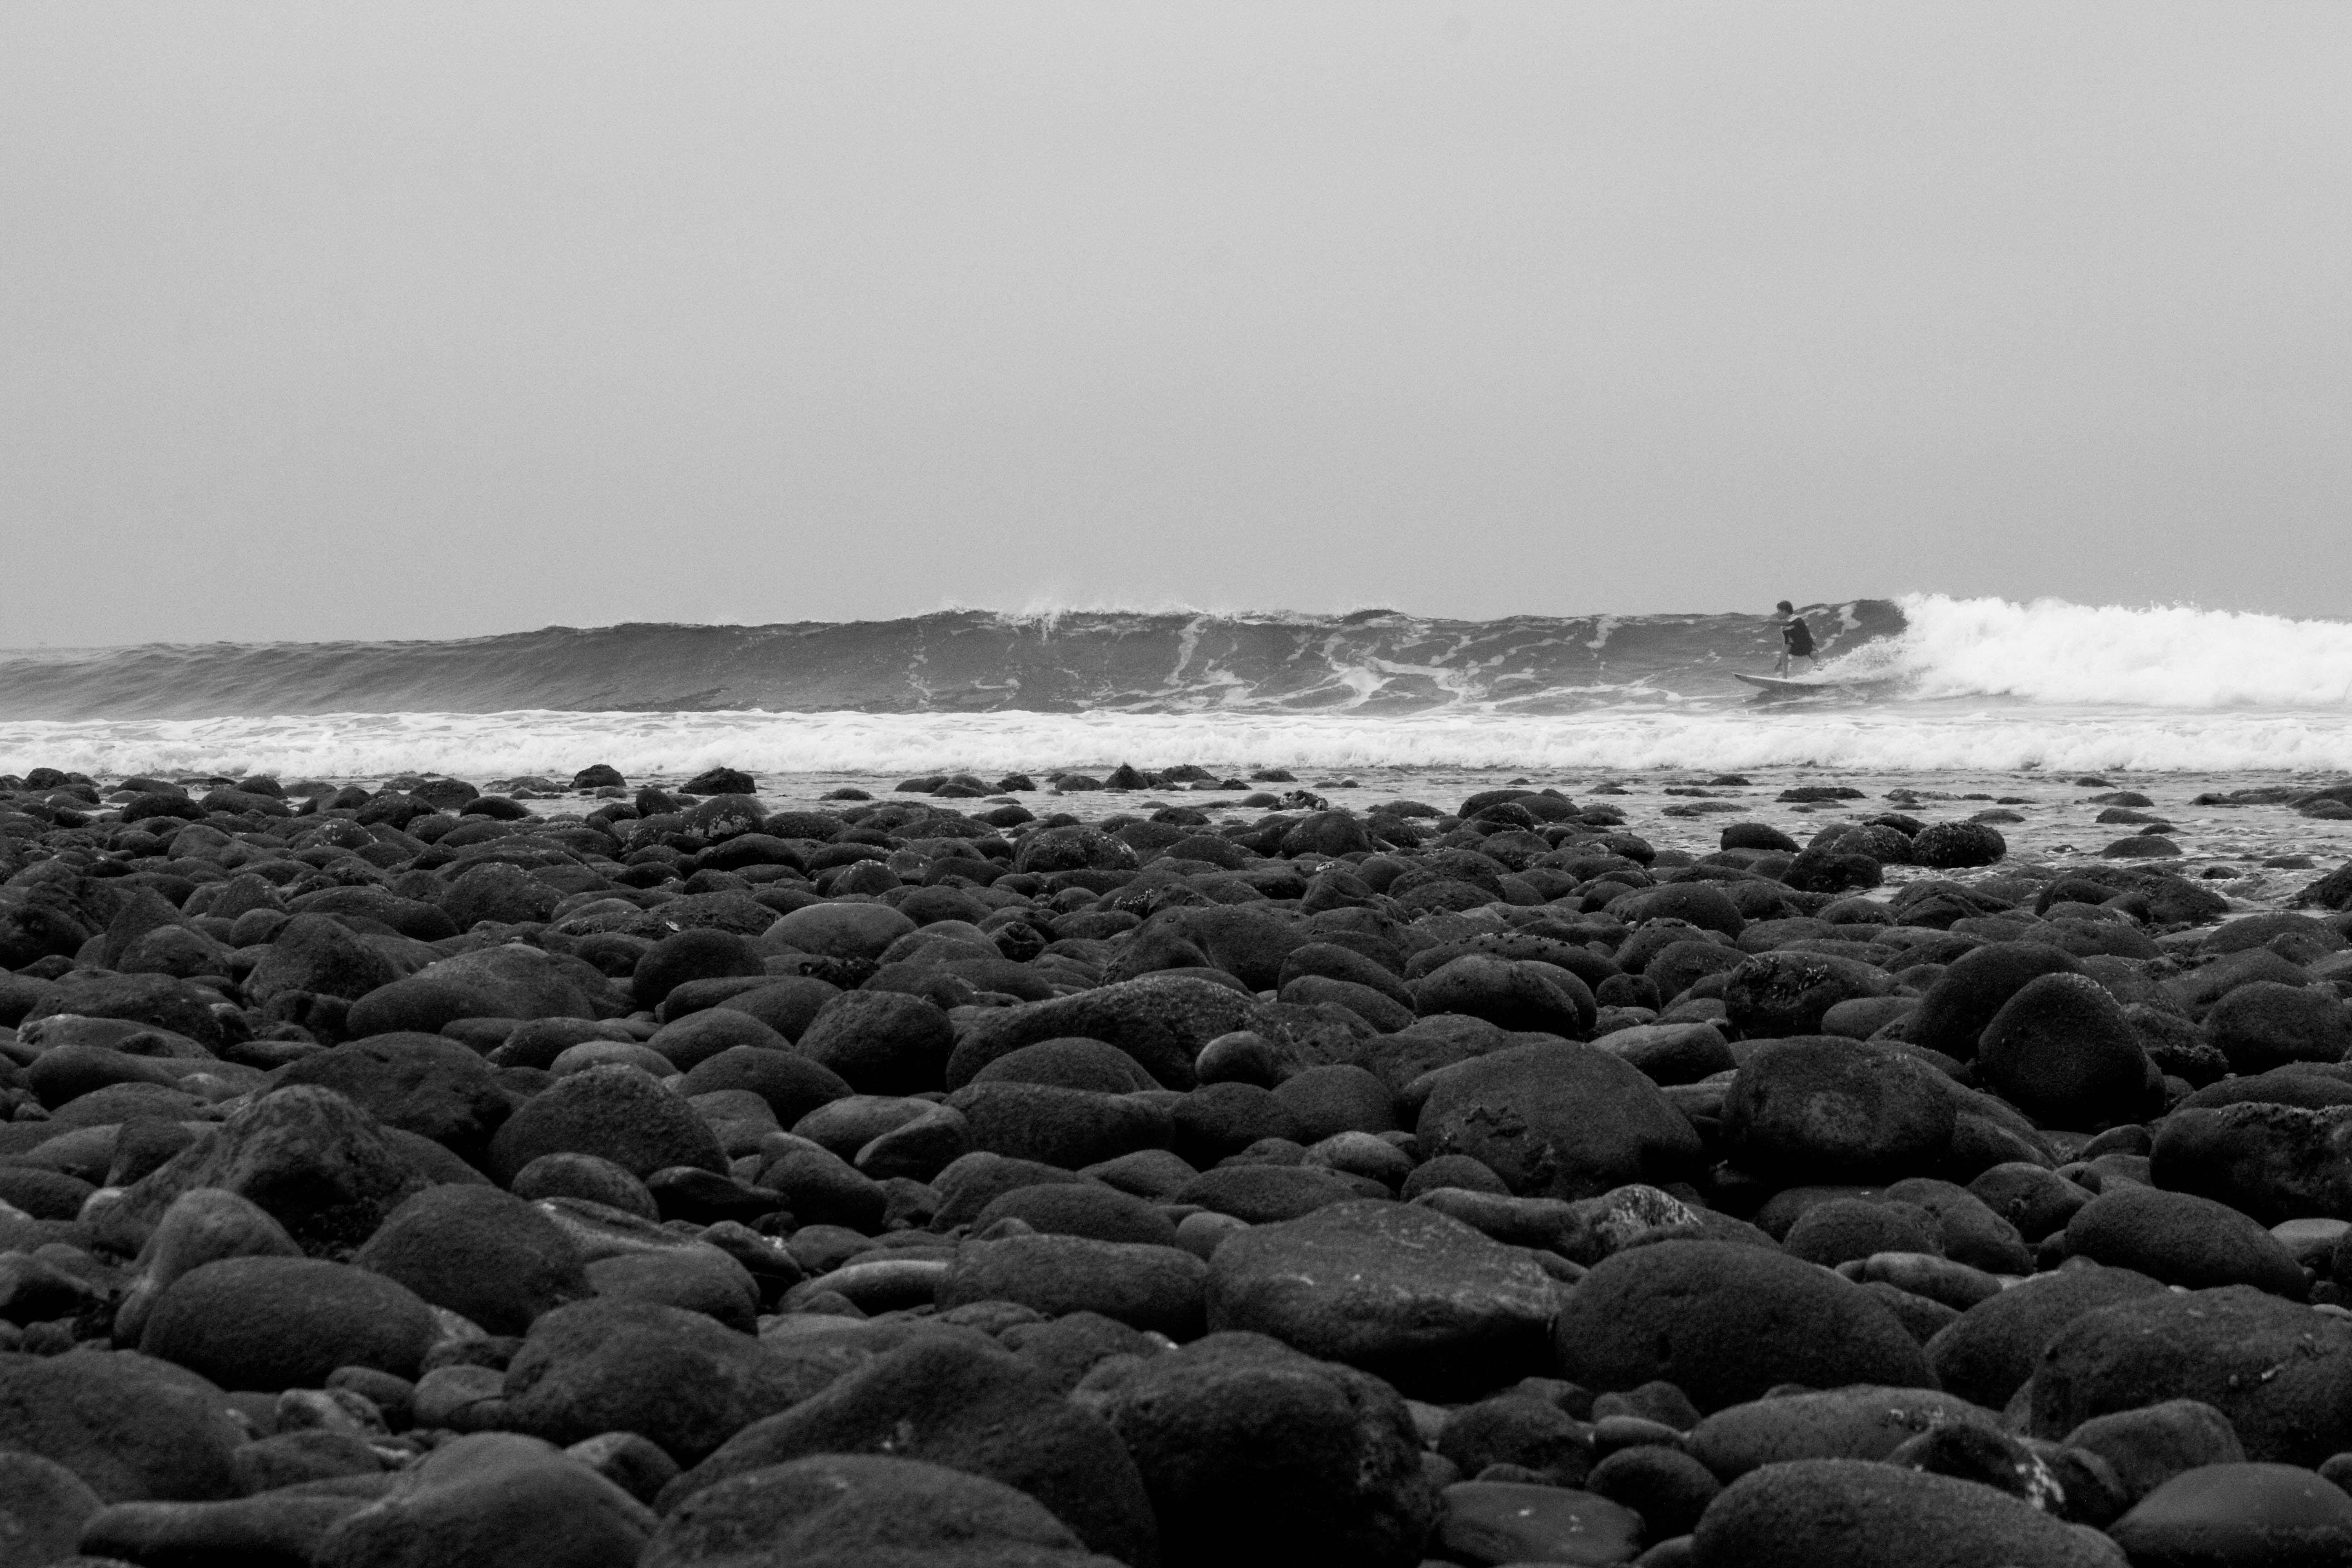 gray stones near the ocean waves